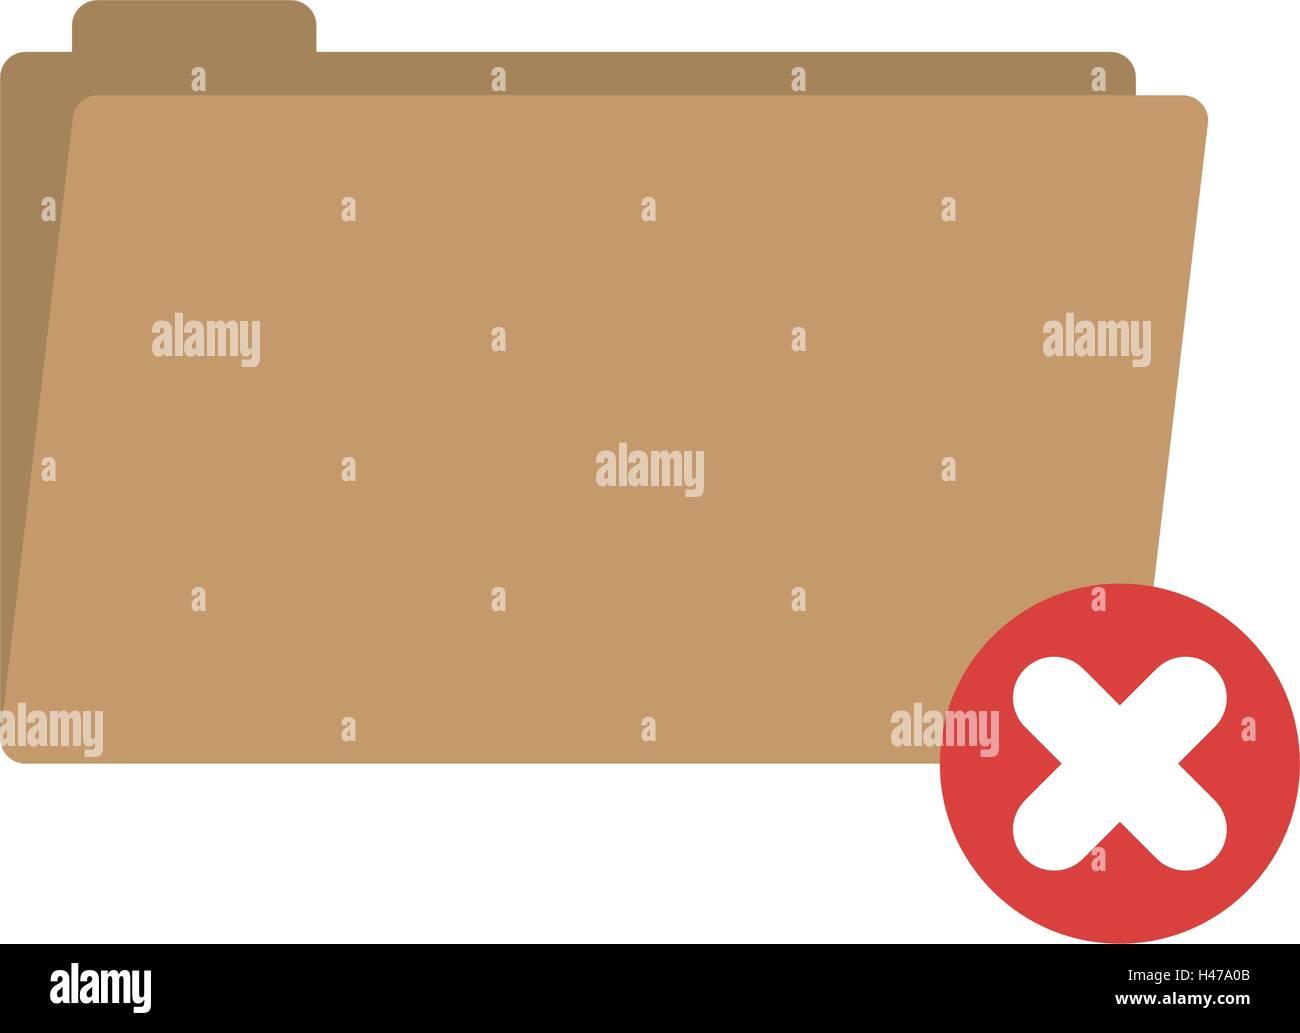 folder symbol to erased files vector illustration - Stock Vector